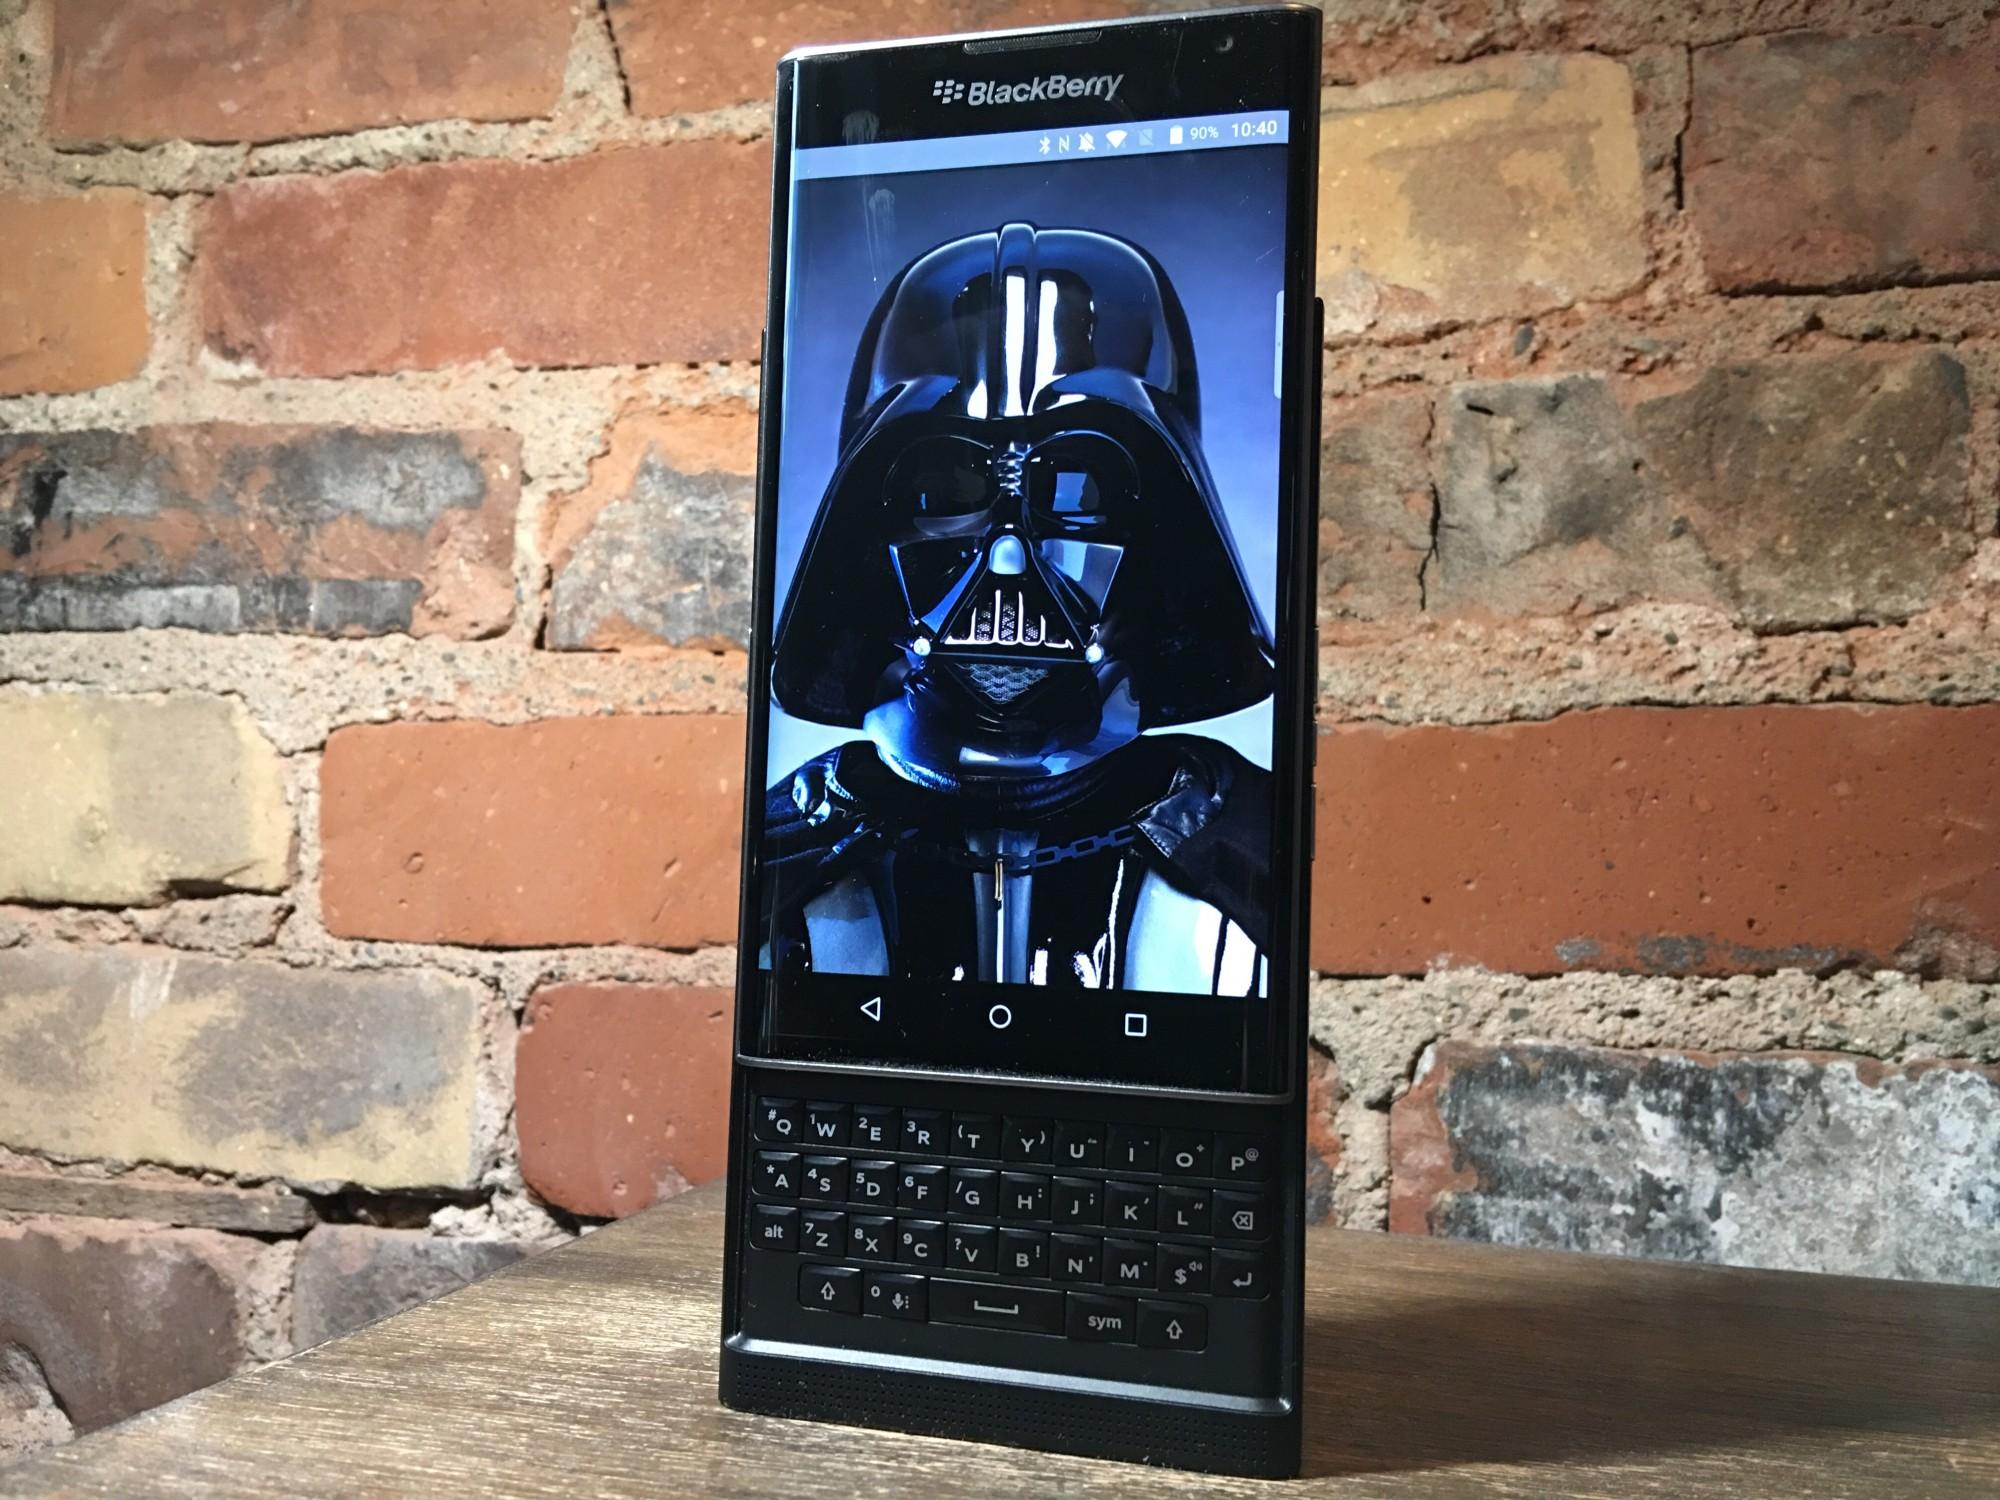 Blackberry-starwars